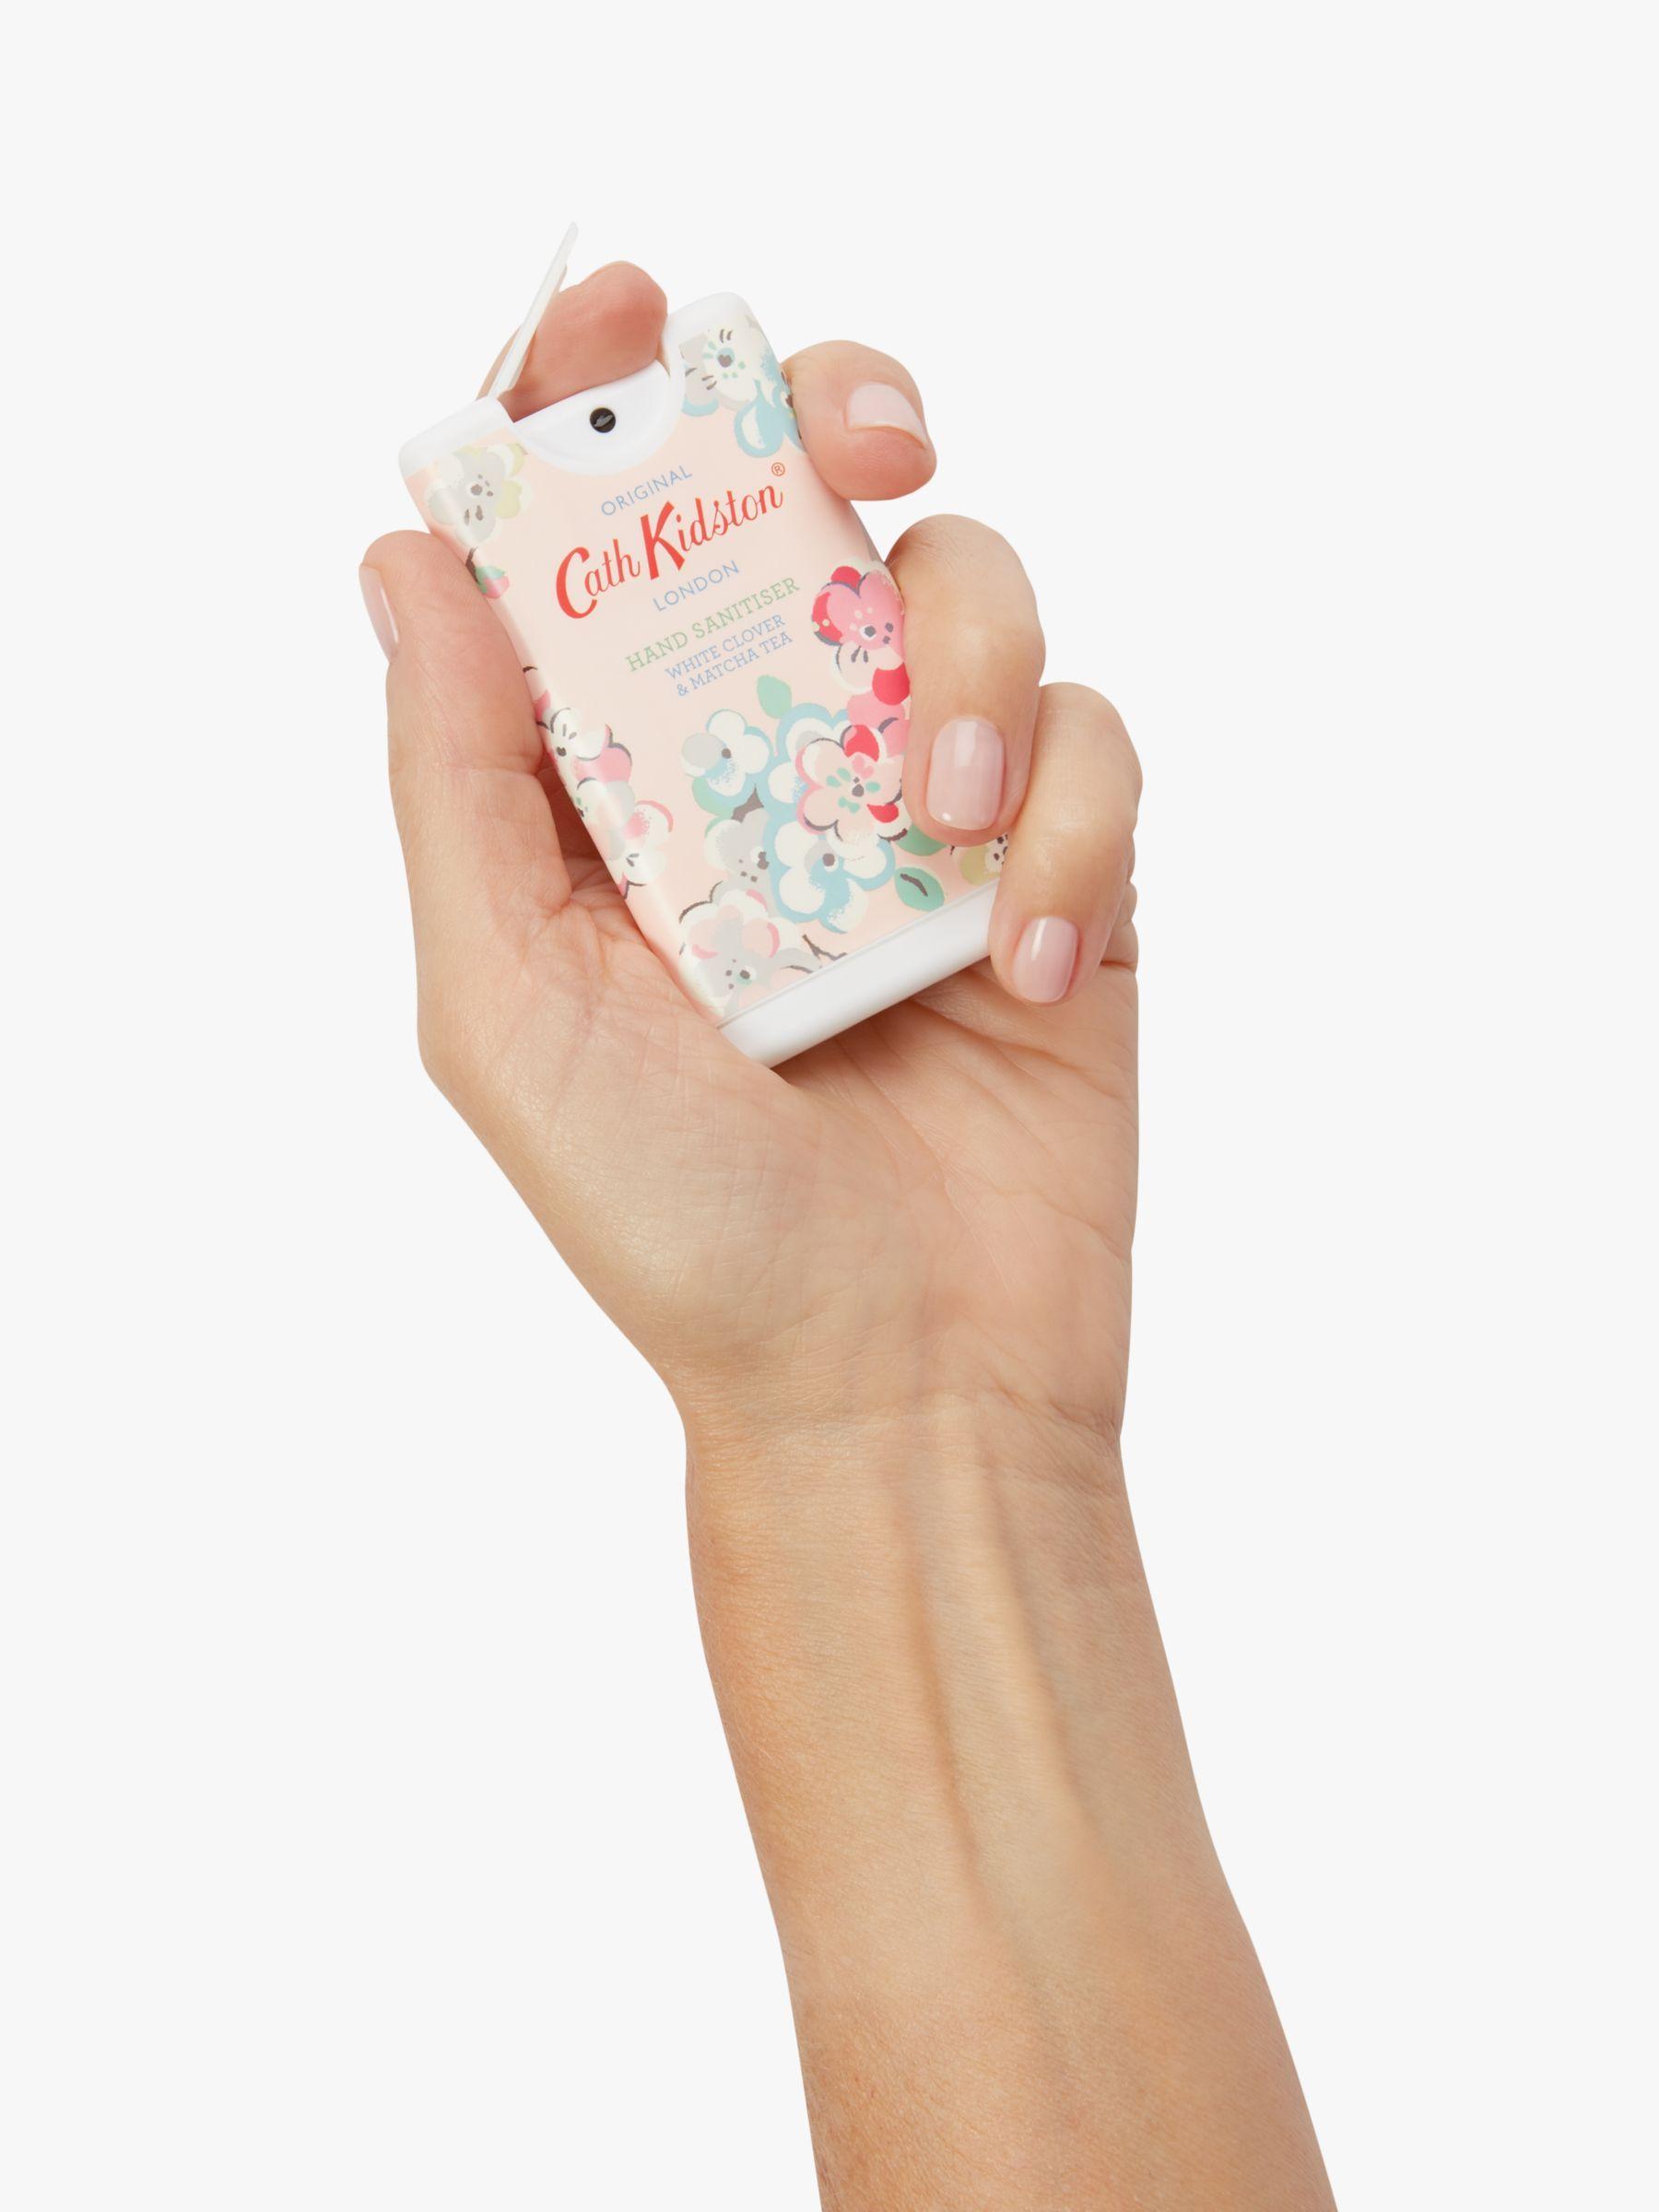 Cath Kidston Floral Hand Sanitiser Hand Sanitizer Cath Kidston